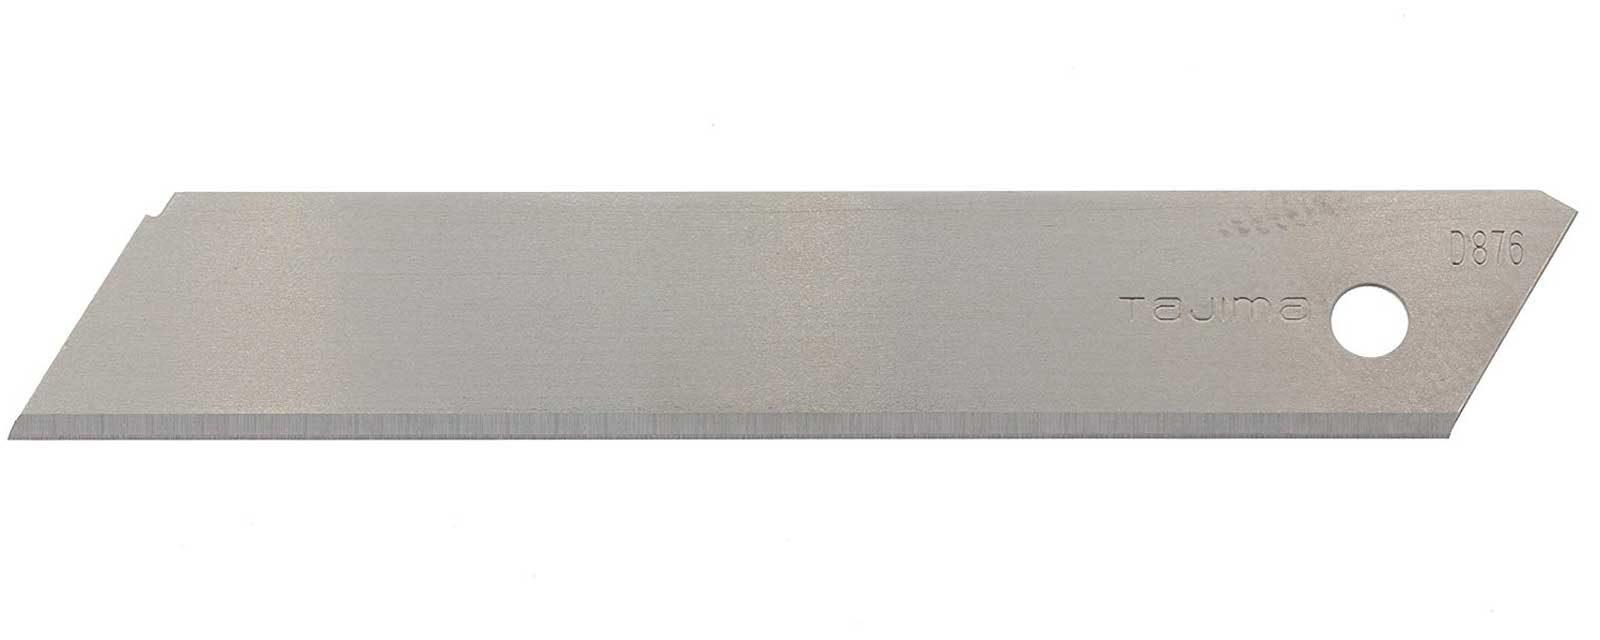 K043-Cuttermesser-Klinge-Abbrechklinge-18mm-ohne-Segmente-Sicherheitsklinge-CURT-tools_1600